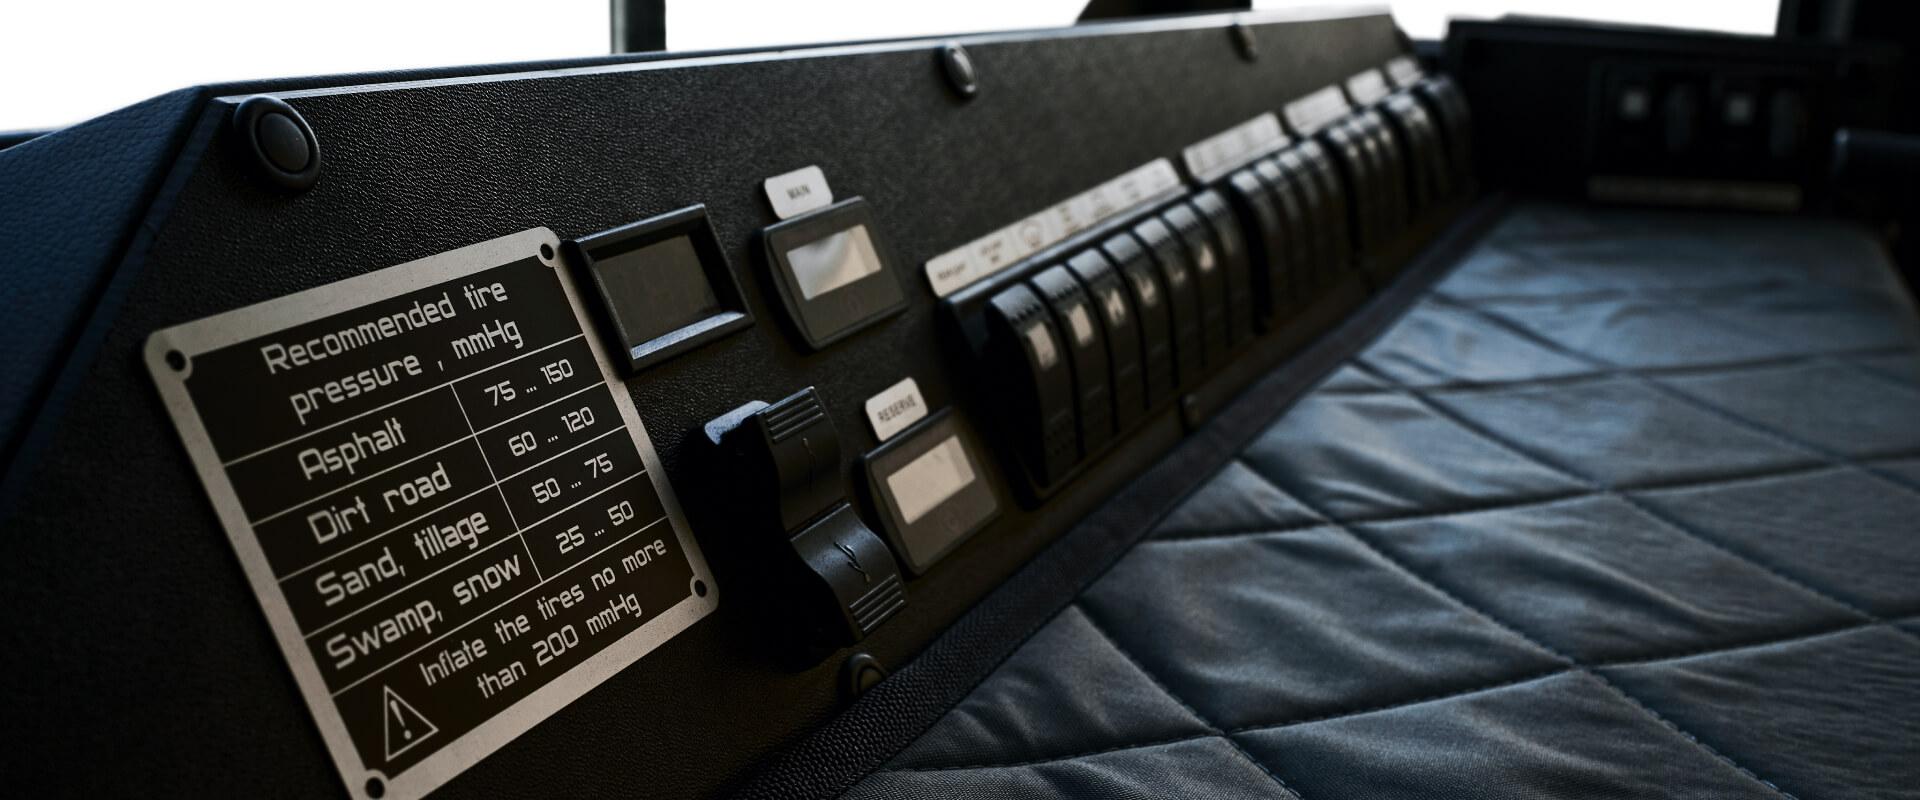 Sherp Pro XT Control Panel